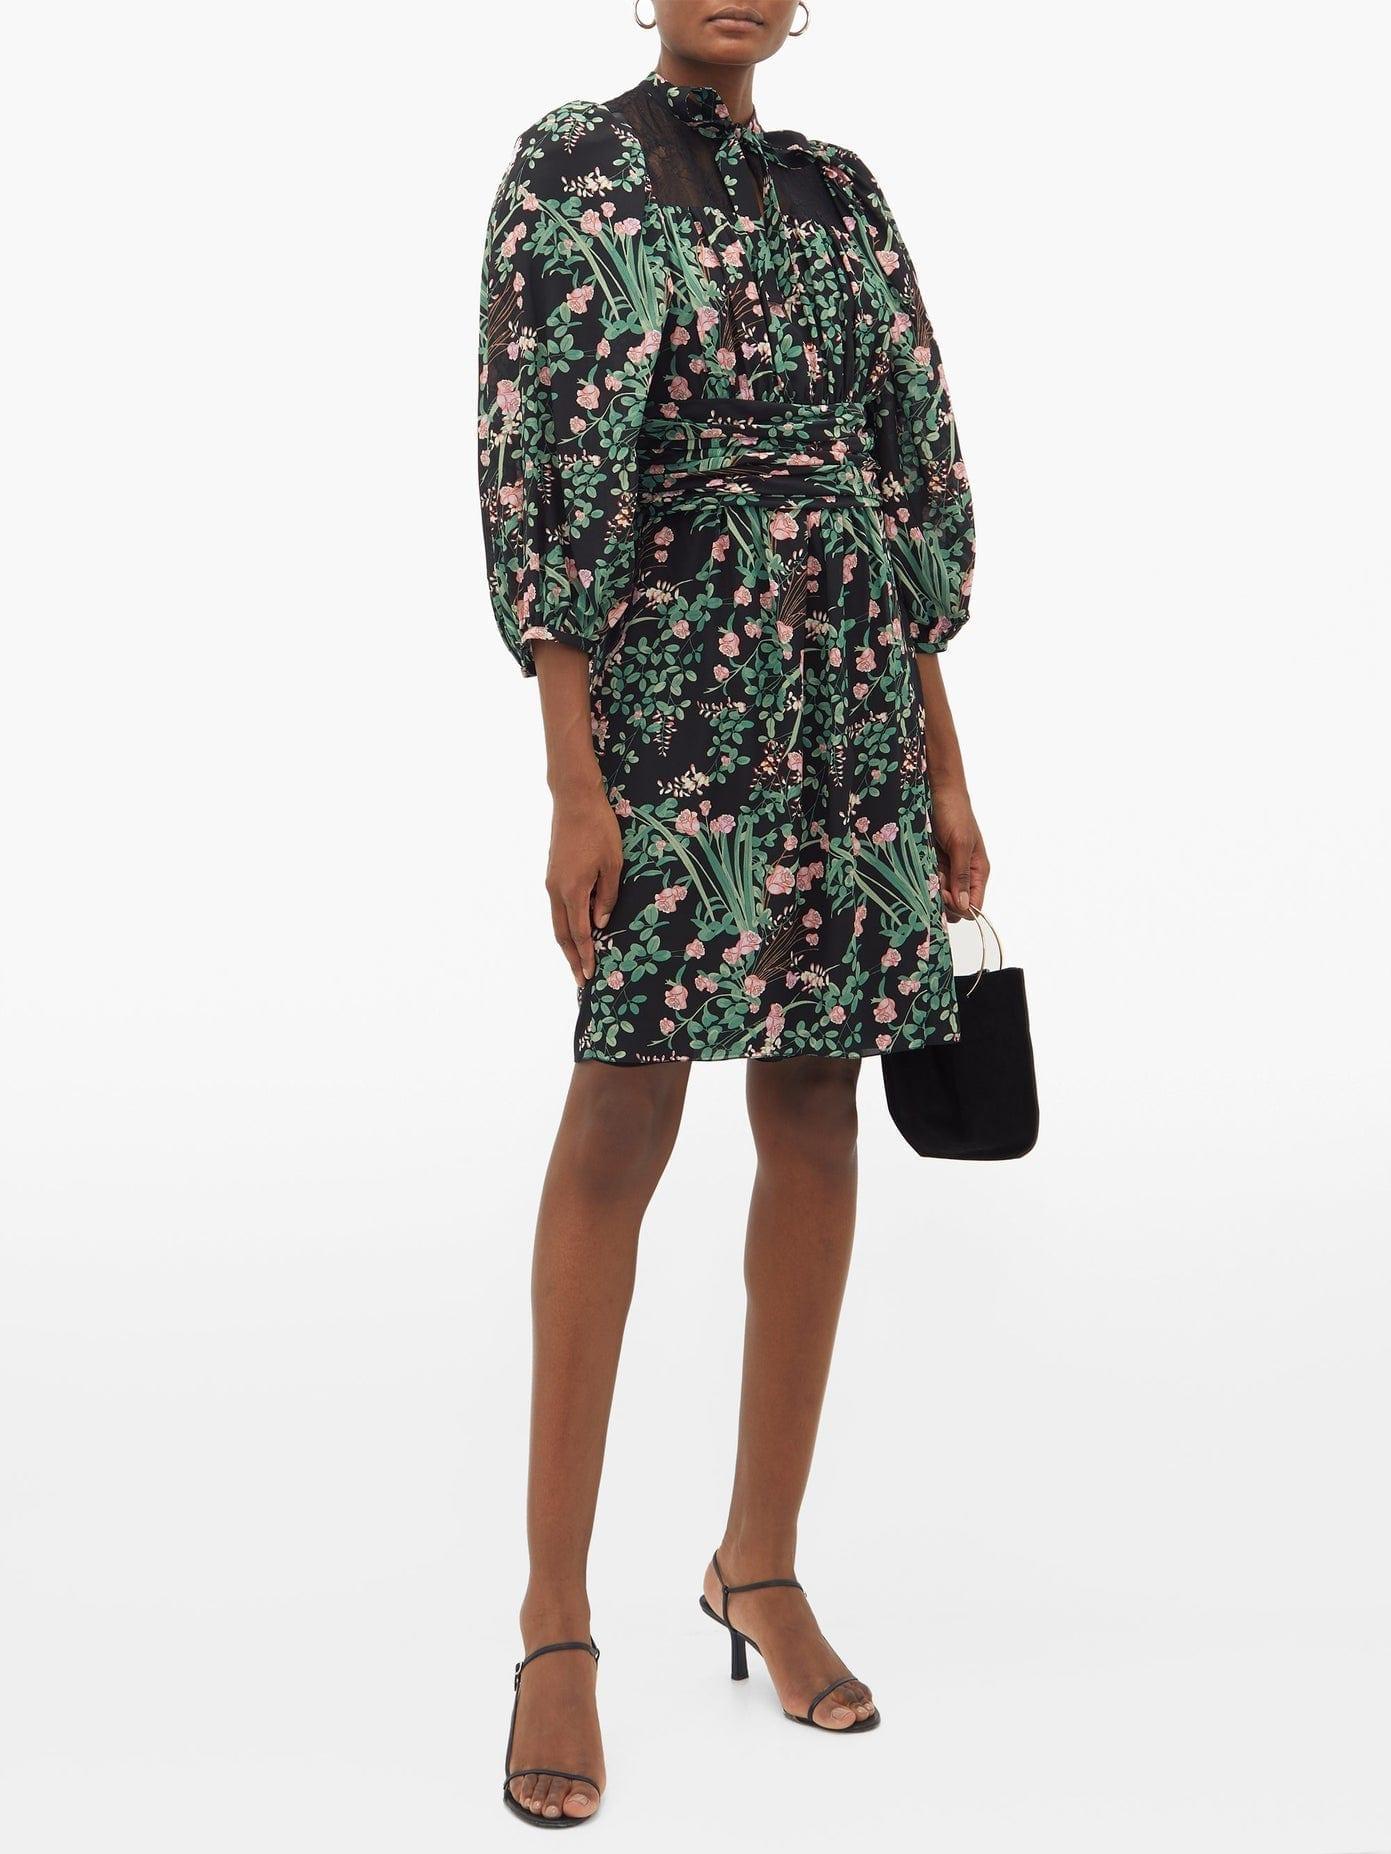 GIAMBATTISTA VALLI Pussy-bow Lace-trimmed Floral-print Silk Dress